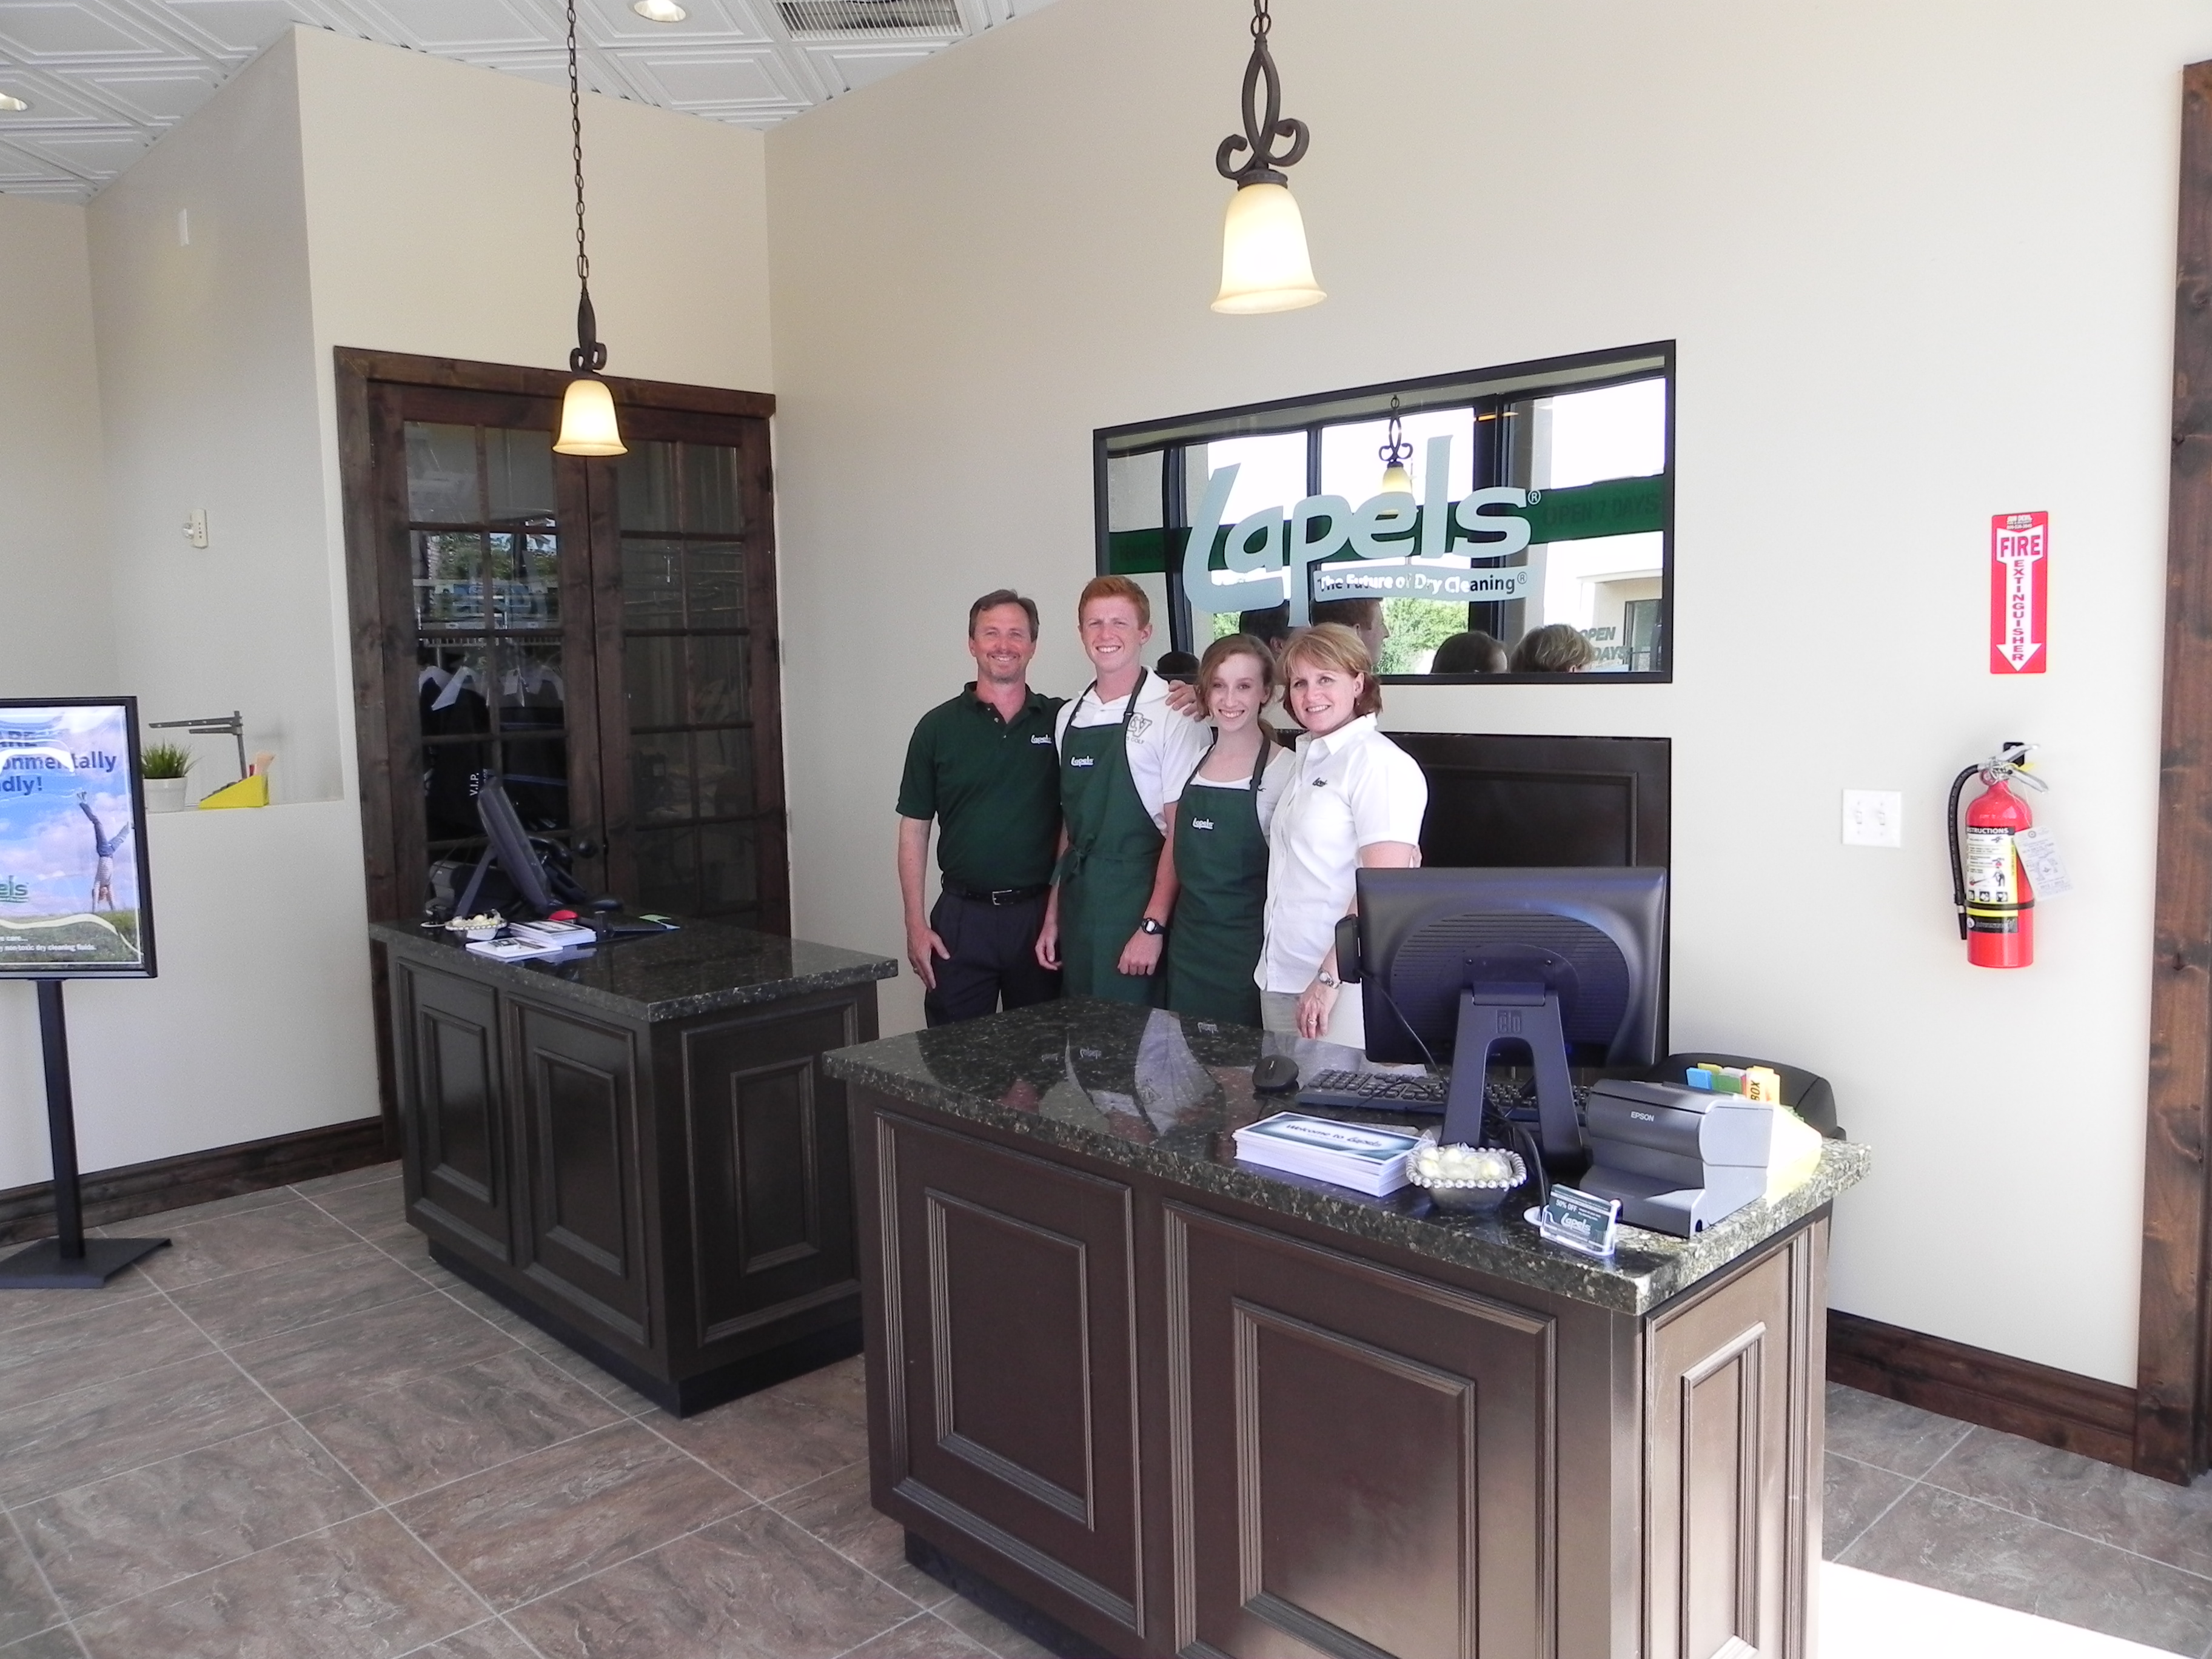 Admirable Lapels Dry Cleaning 2586 S Val Vista Dr Suite 101 Gilbert Interior Design Ideas Tzicisoteloinfo